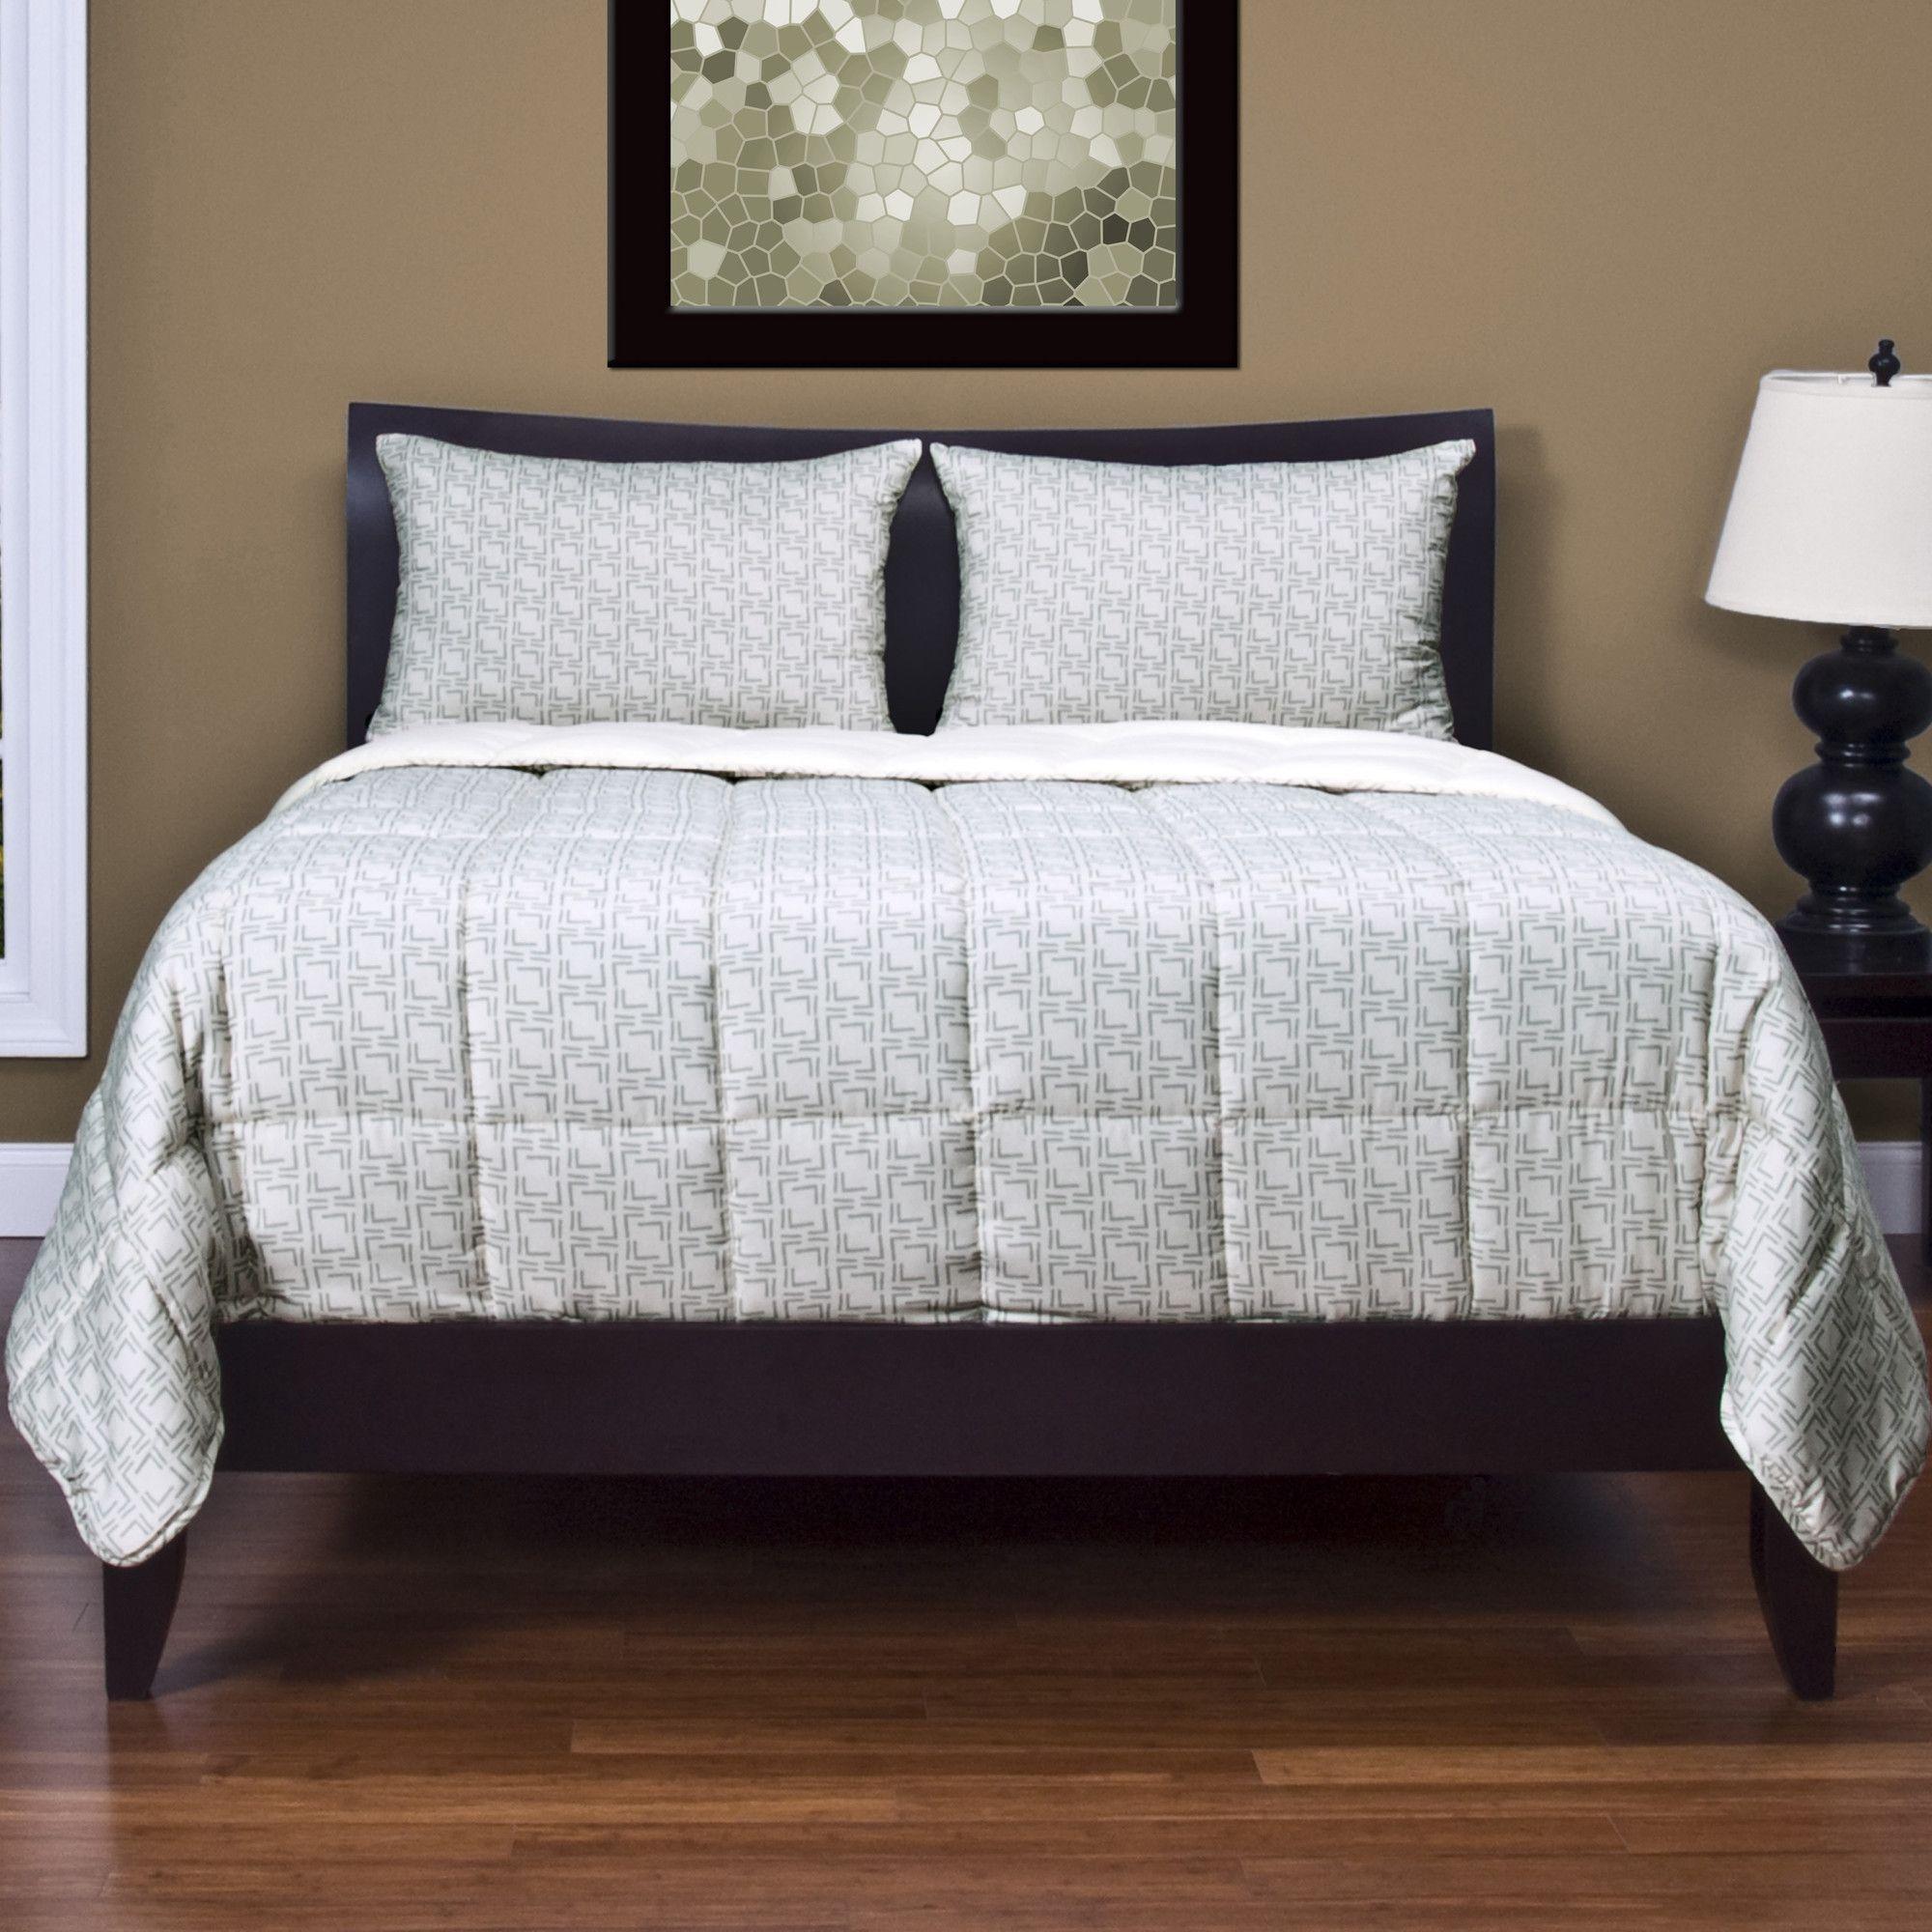 Tidwell Reversible Quilt Set Bed, Duvet cover sets